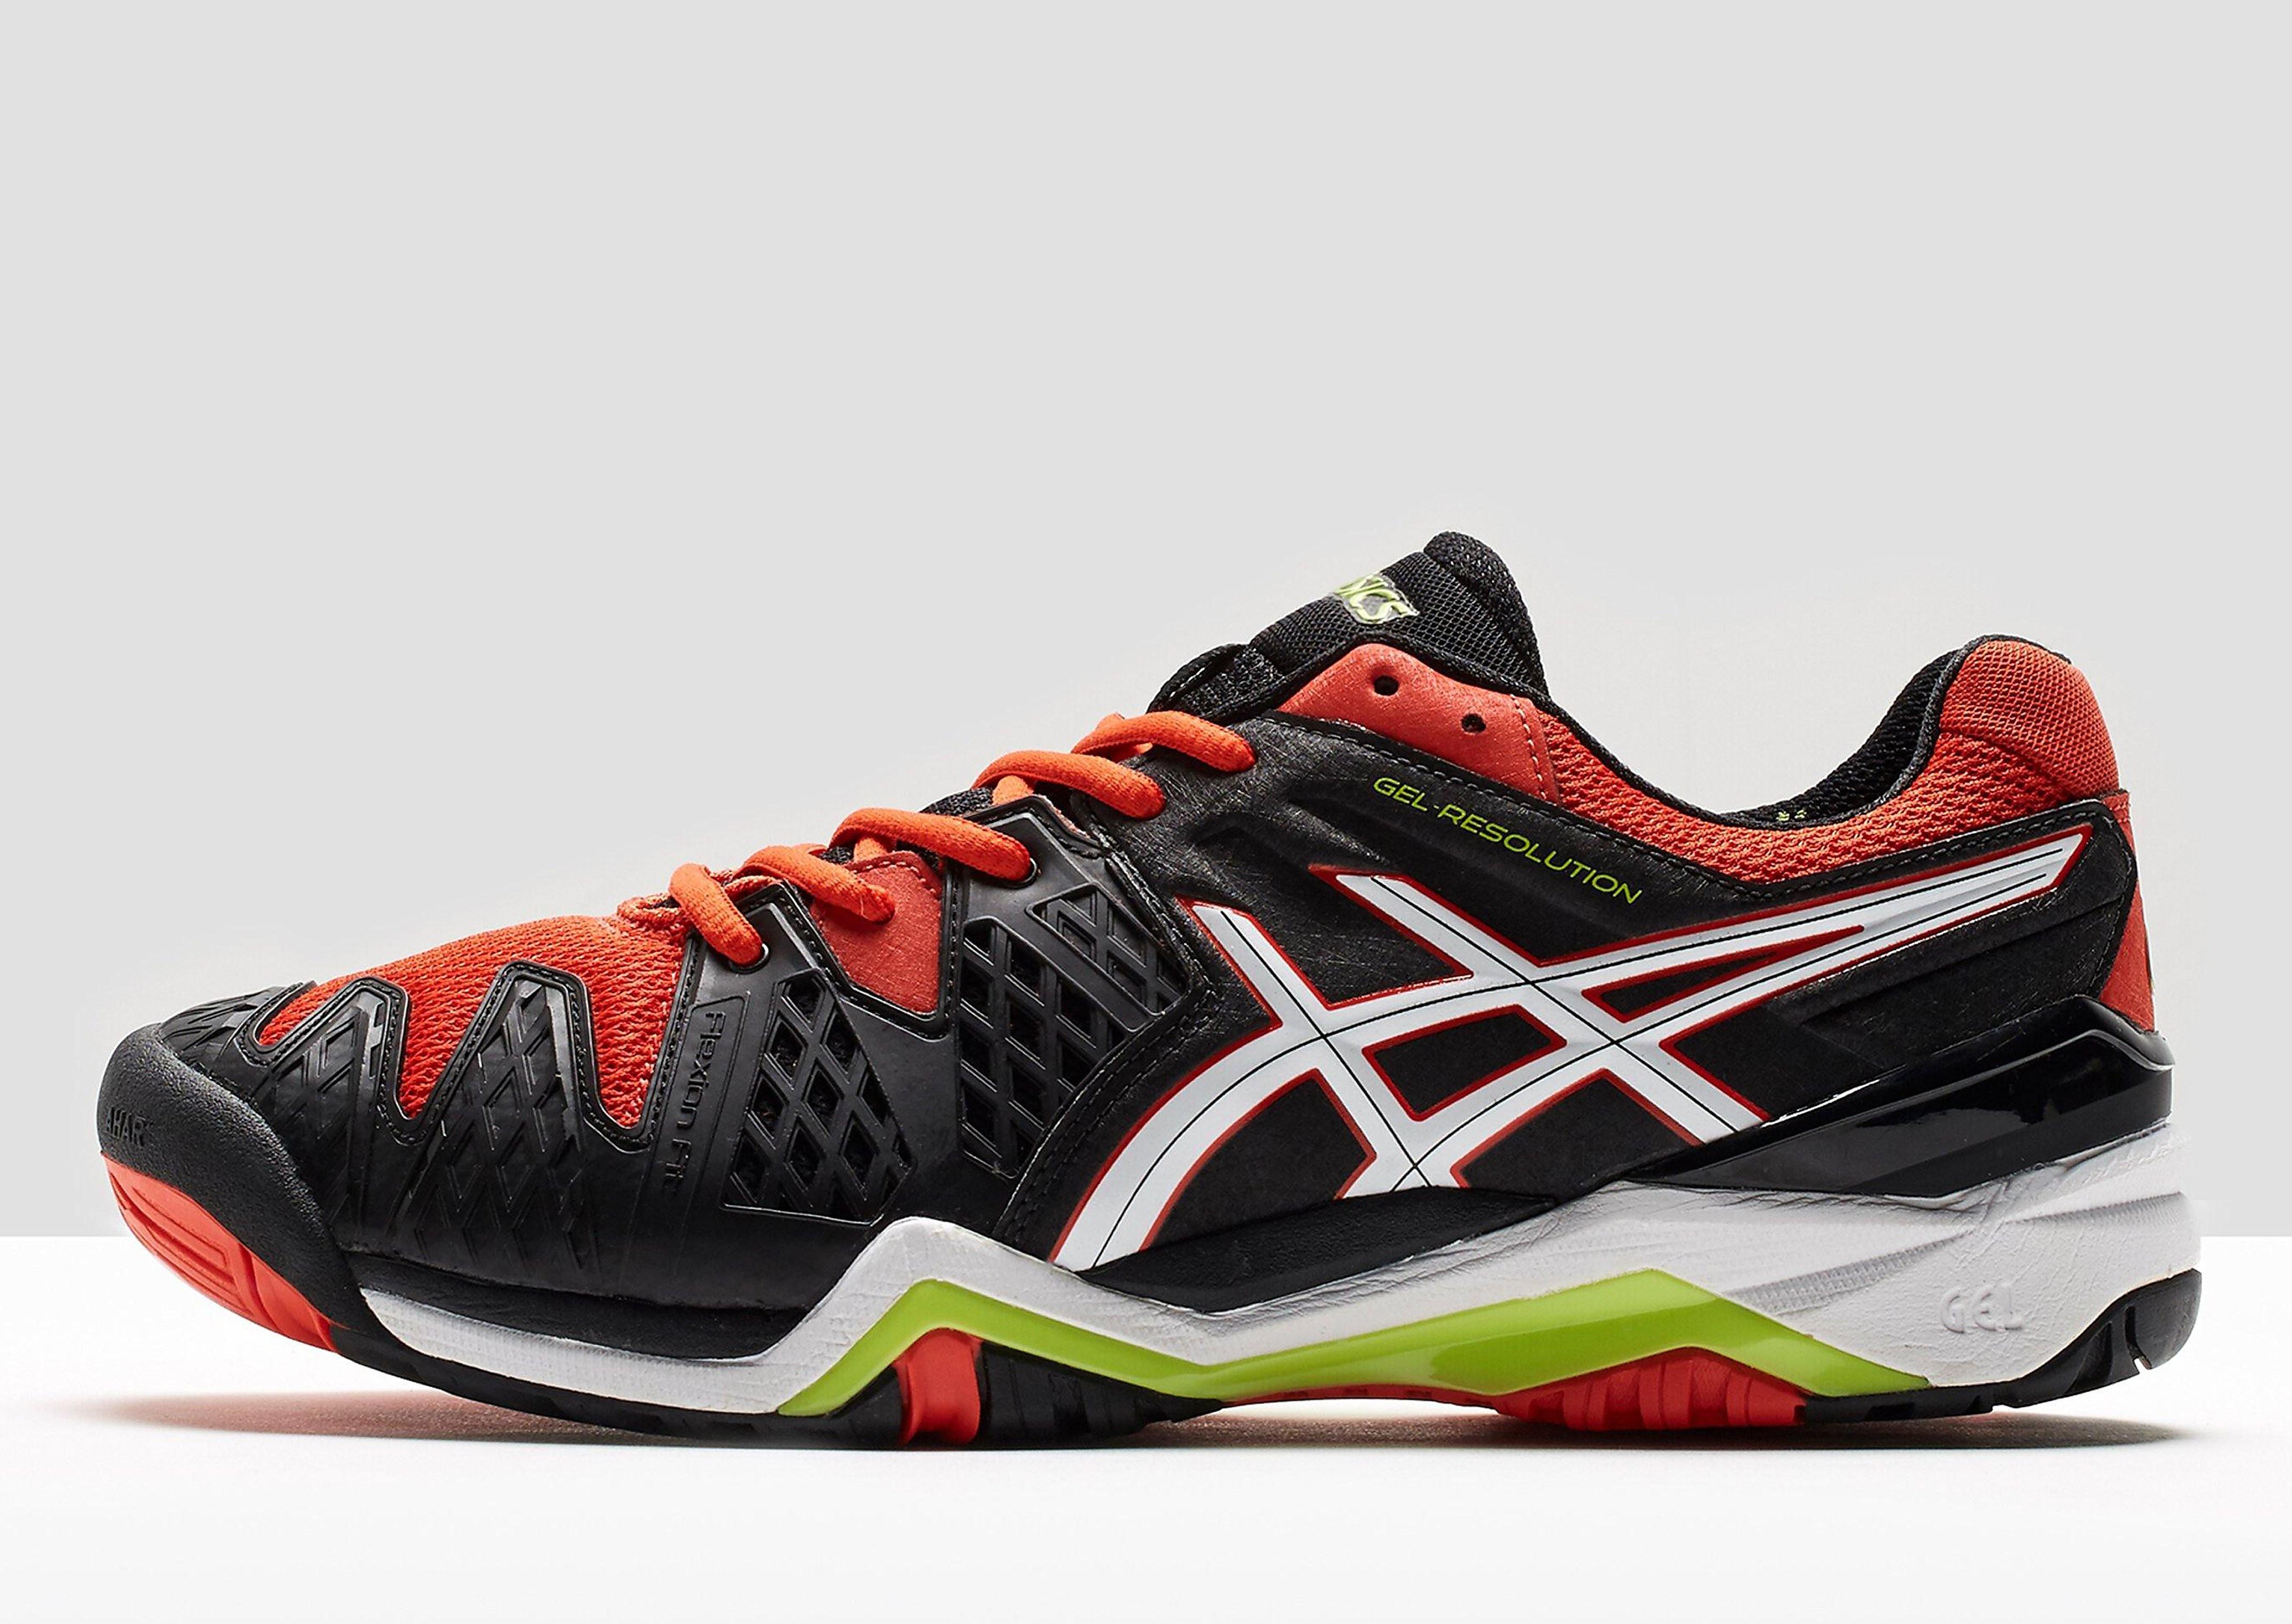 ASICS Gel-Resolution 6 Men's Tennis Shoes